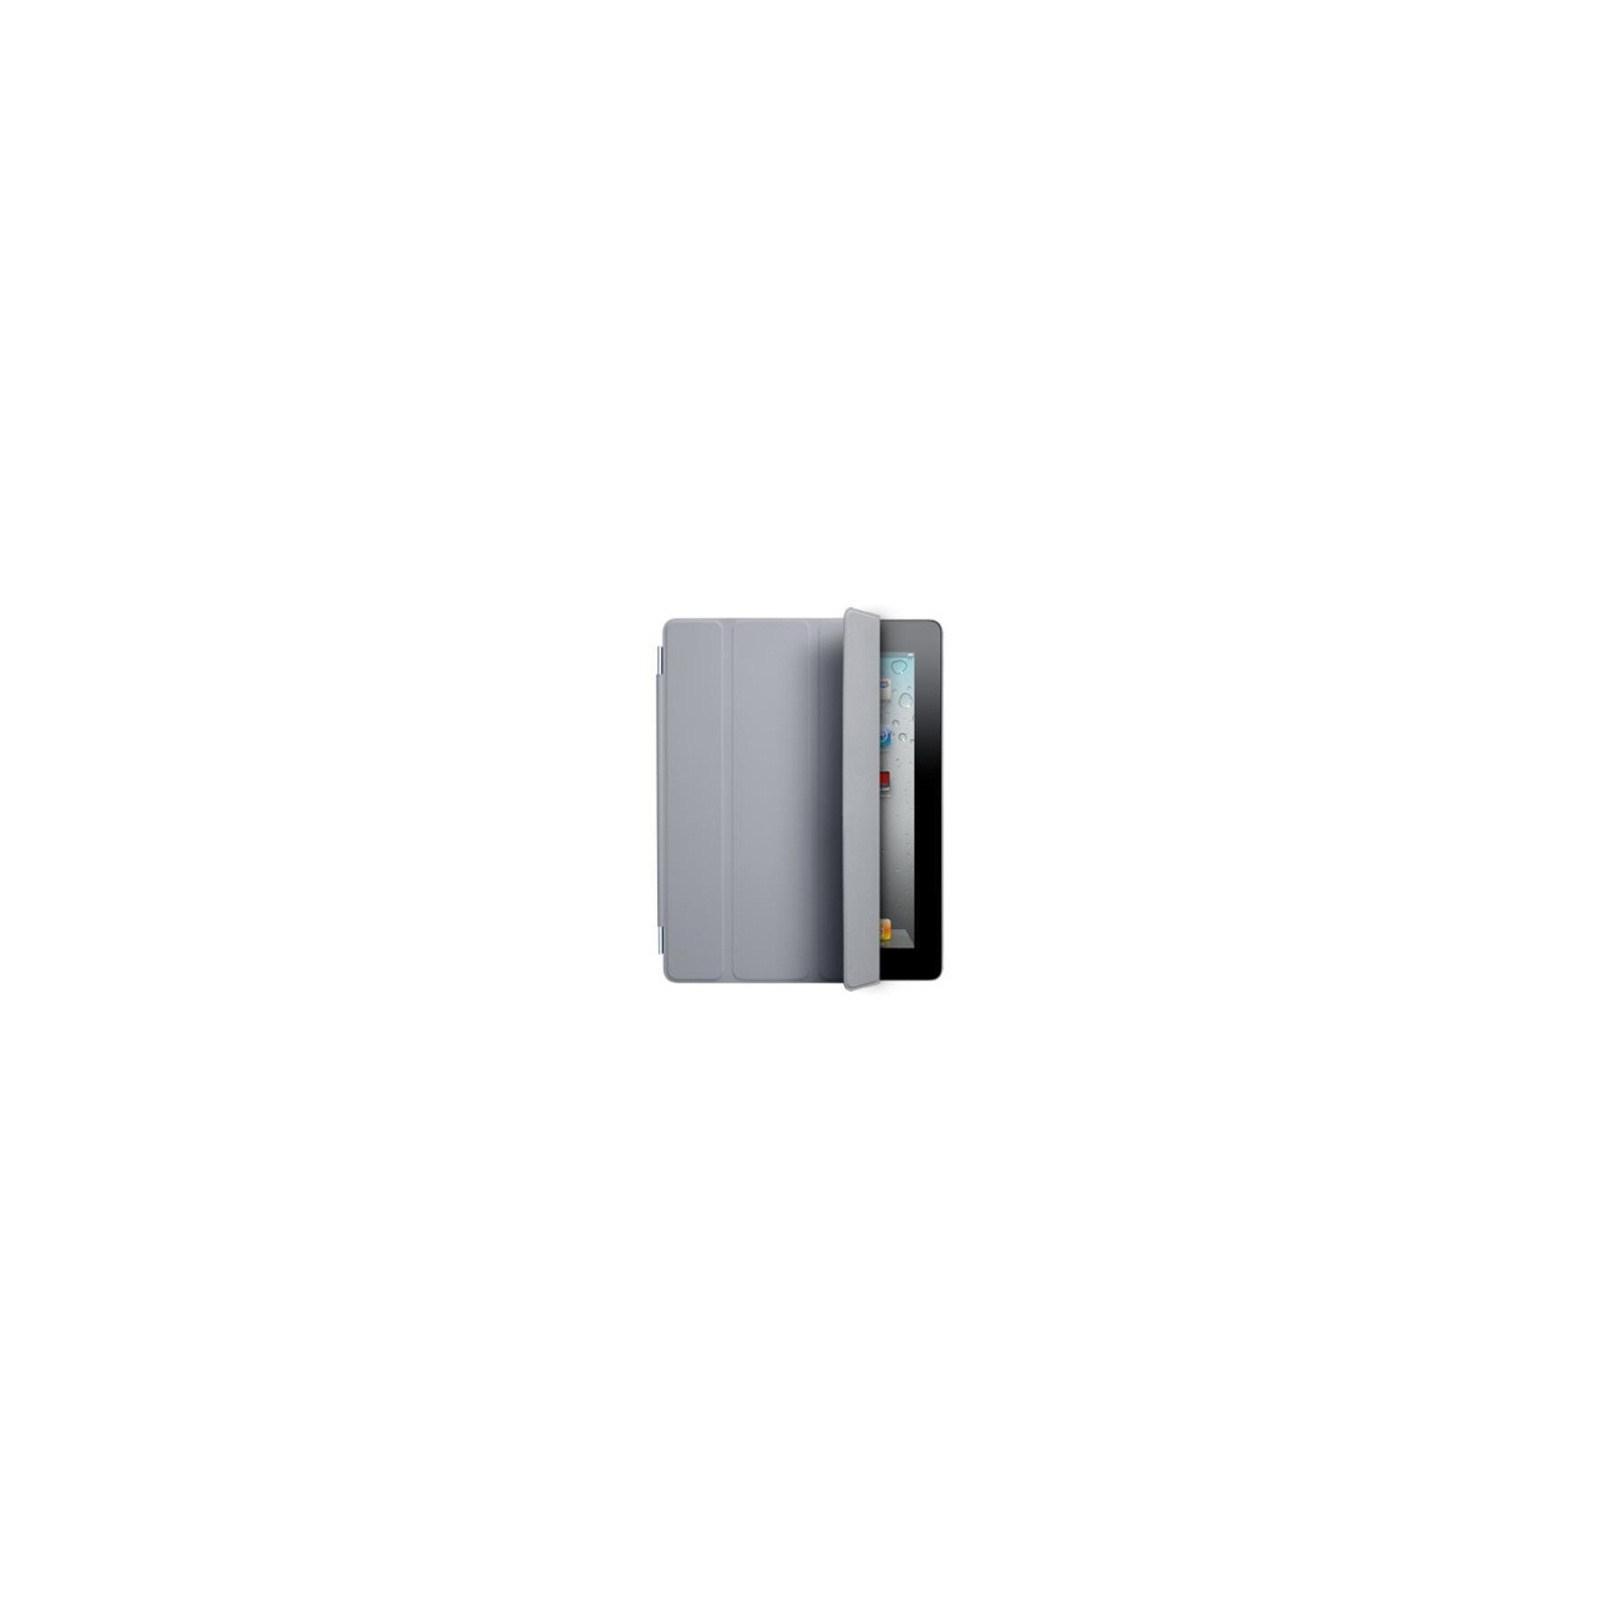 Чехол для планшета Apple Smart Cover для iPad 2 (light gray) (MD307ZM/A)